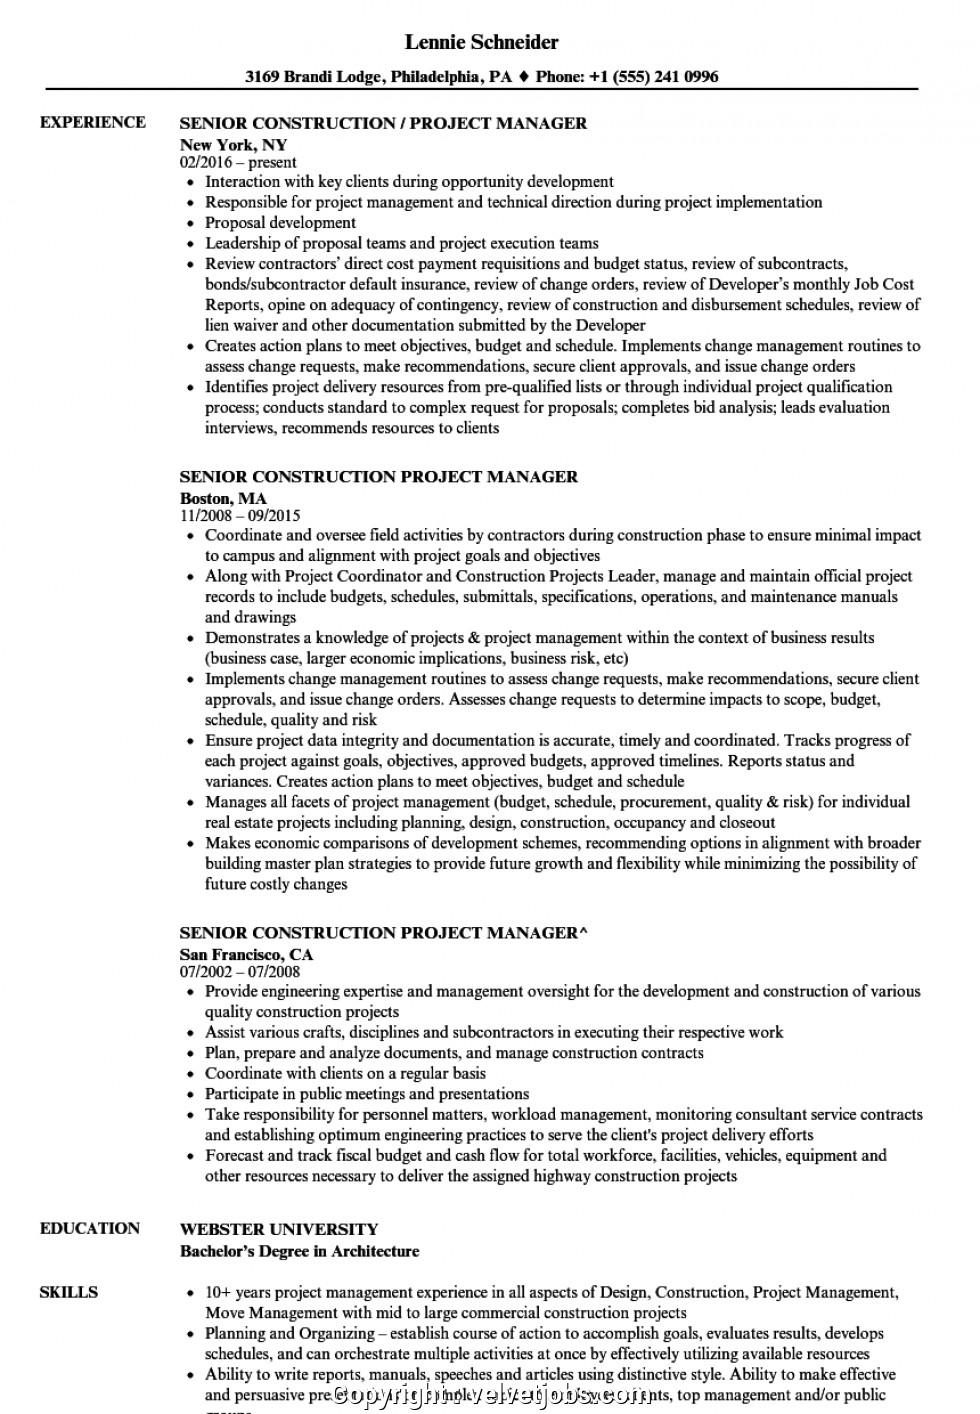 Senior Construction Project Manager Resume Samples Simple Construction Project Manager Resume Sample Senior